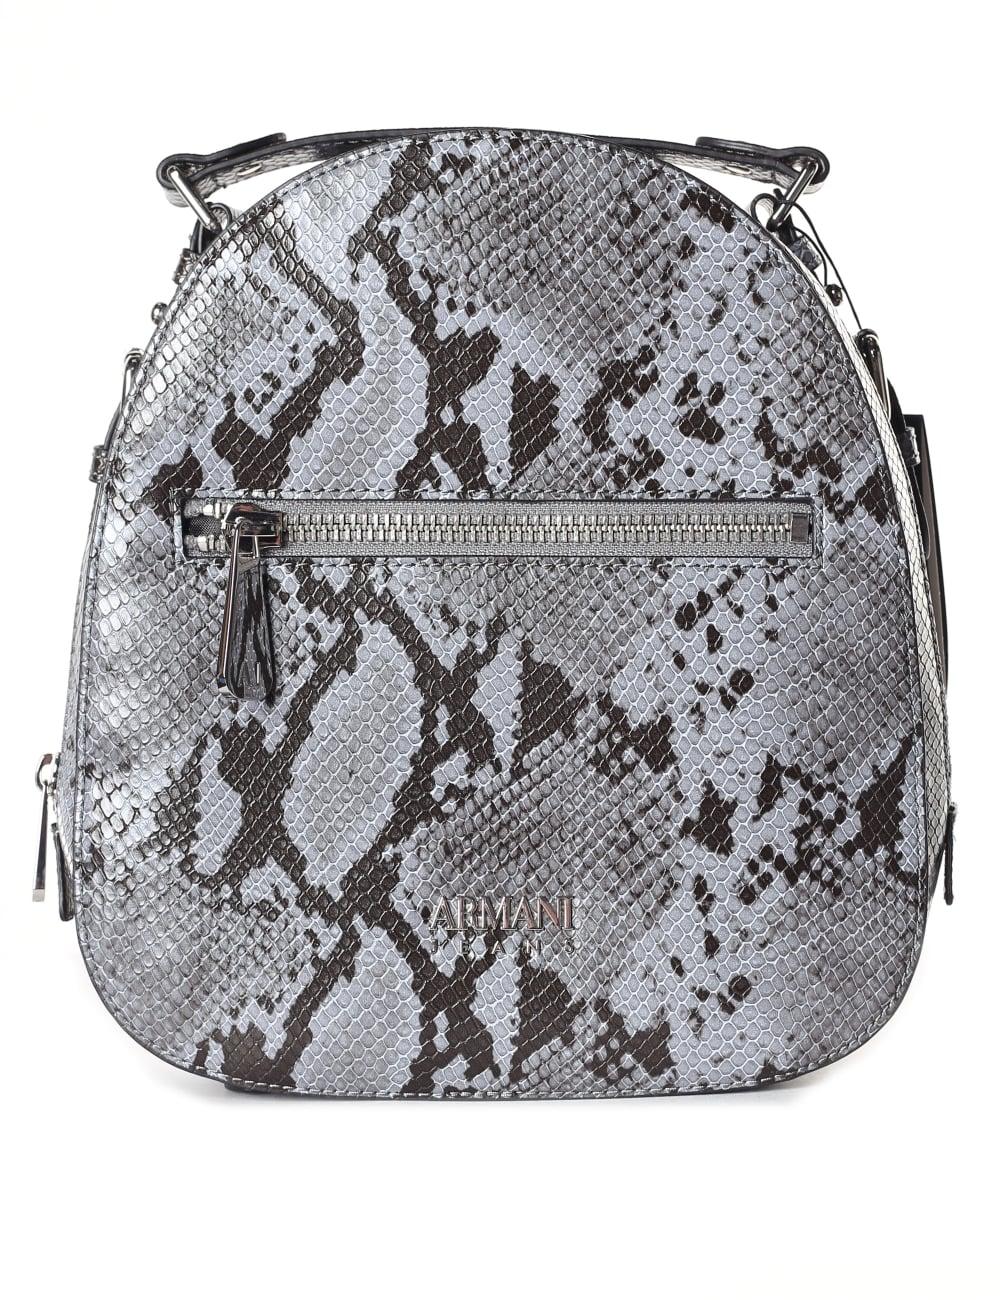 0c33b41b2b9a Armani Jeans Women s Top Handle Bag Avio